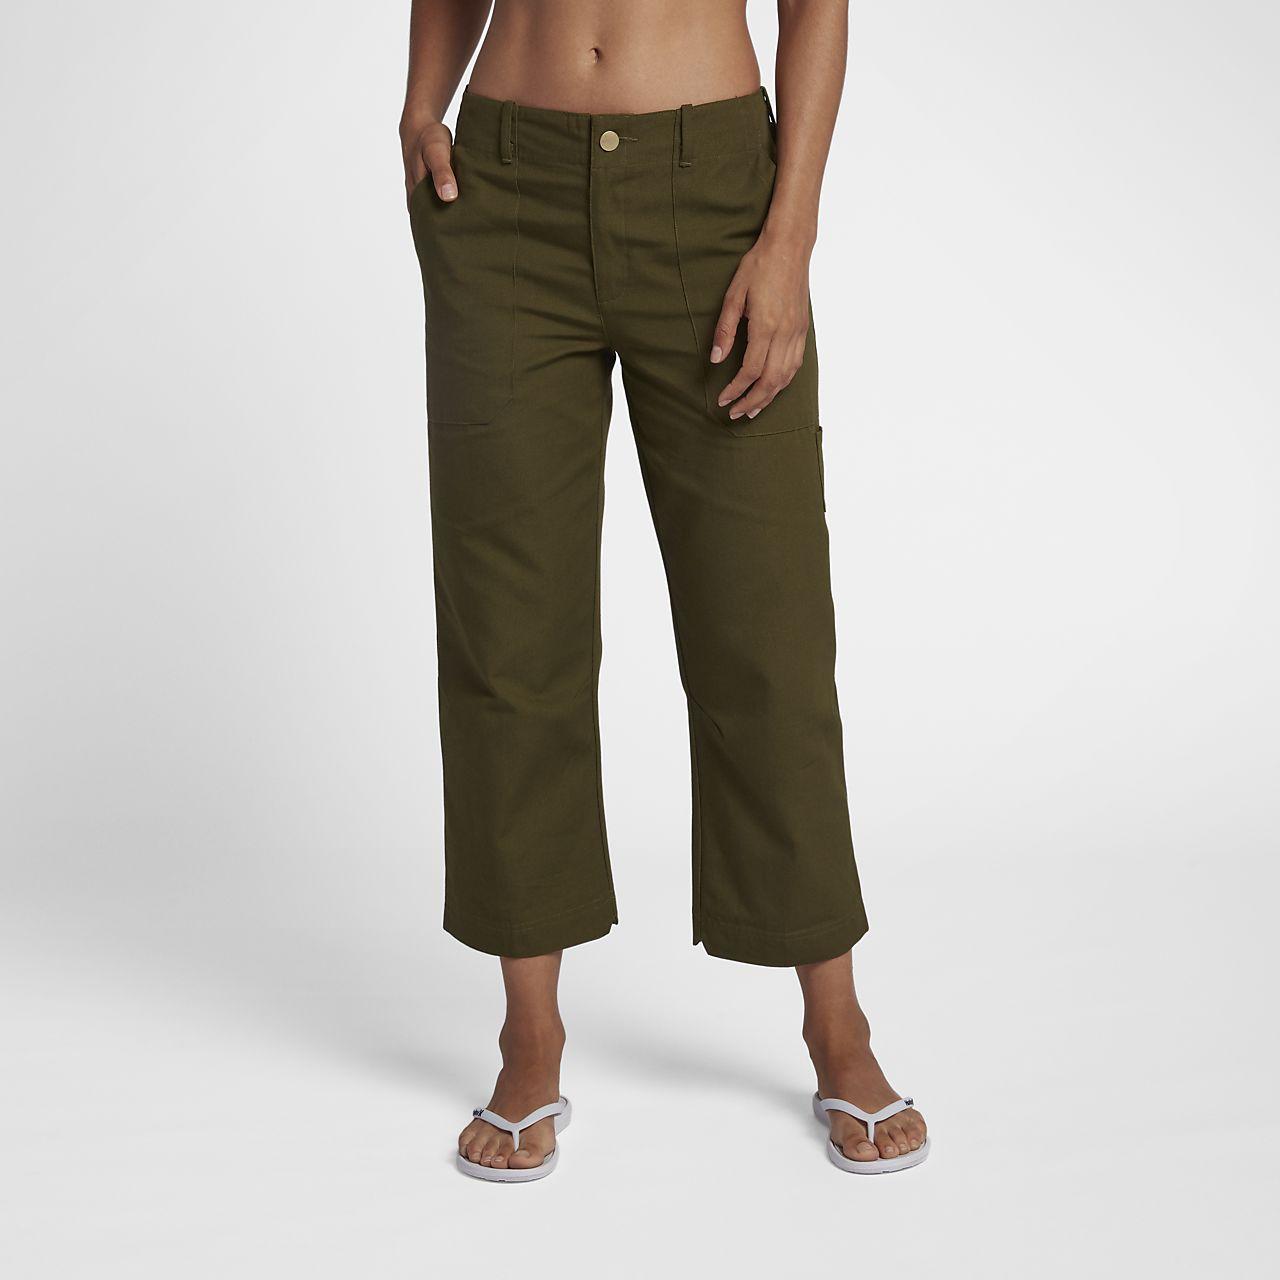 28dce2dc055d1 Hurley Lowrider Wide Leg Women s Pants. Nike.com